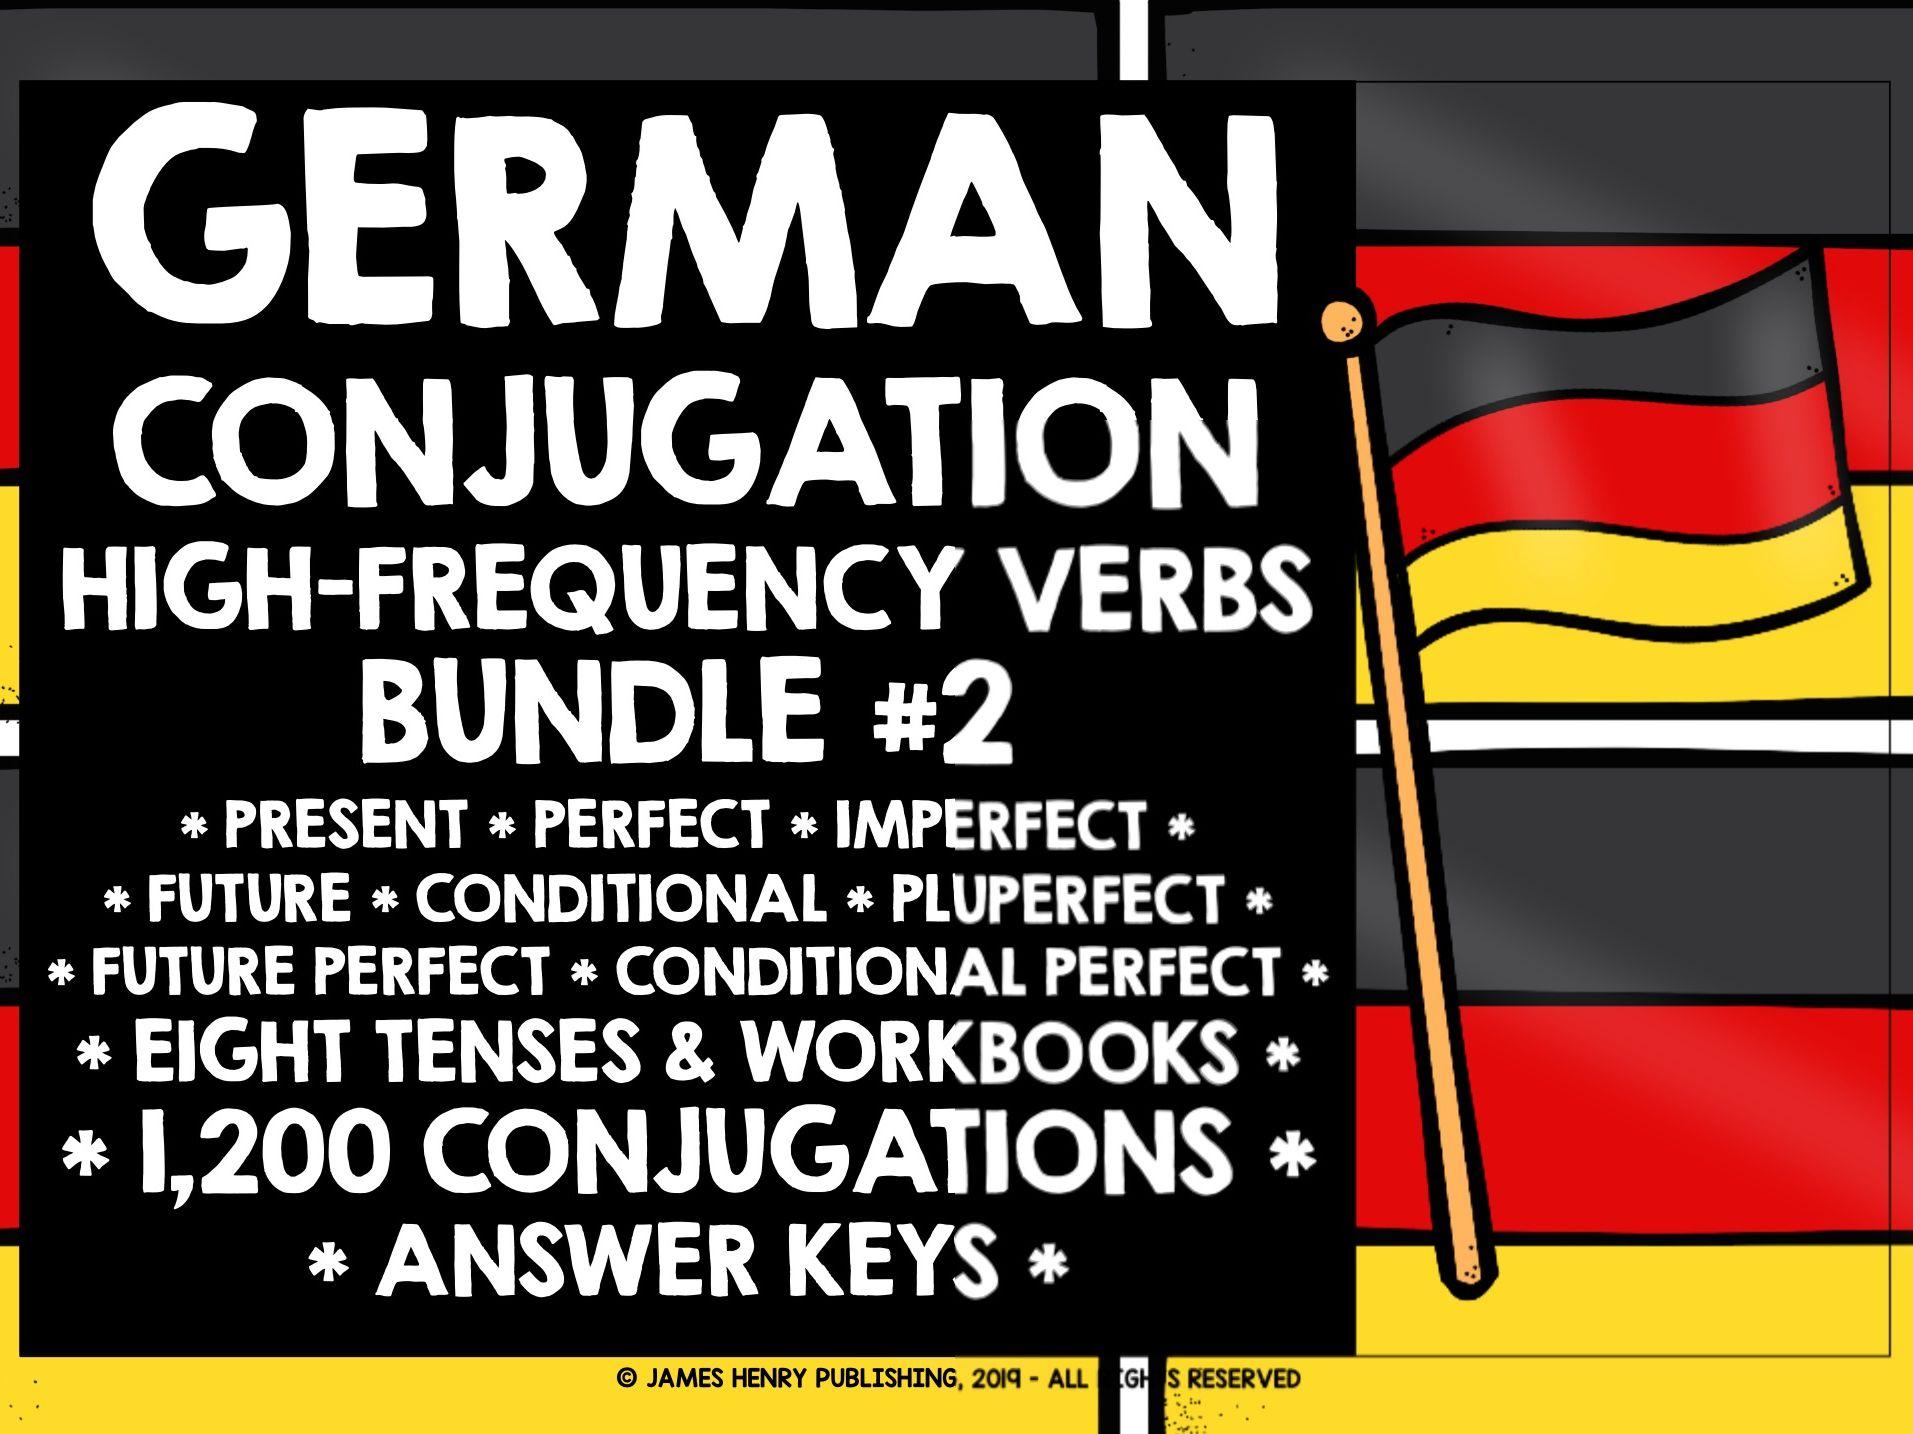 GERMAN HIGH-FREQUENCY VERBS CONJUGATION BUNDLE #2